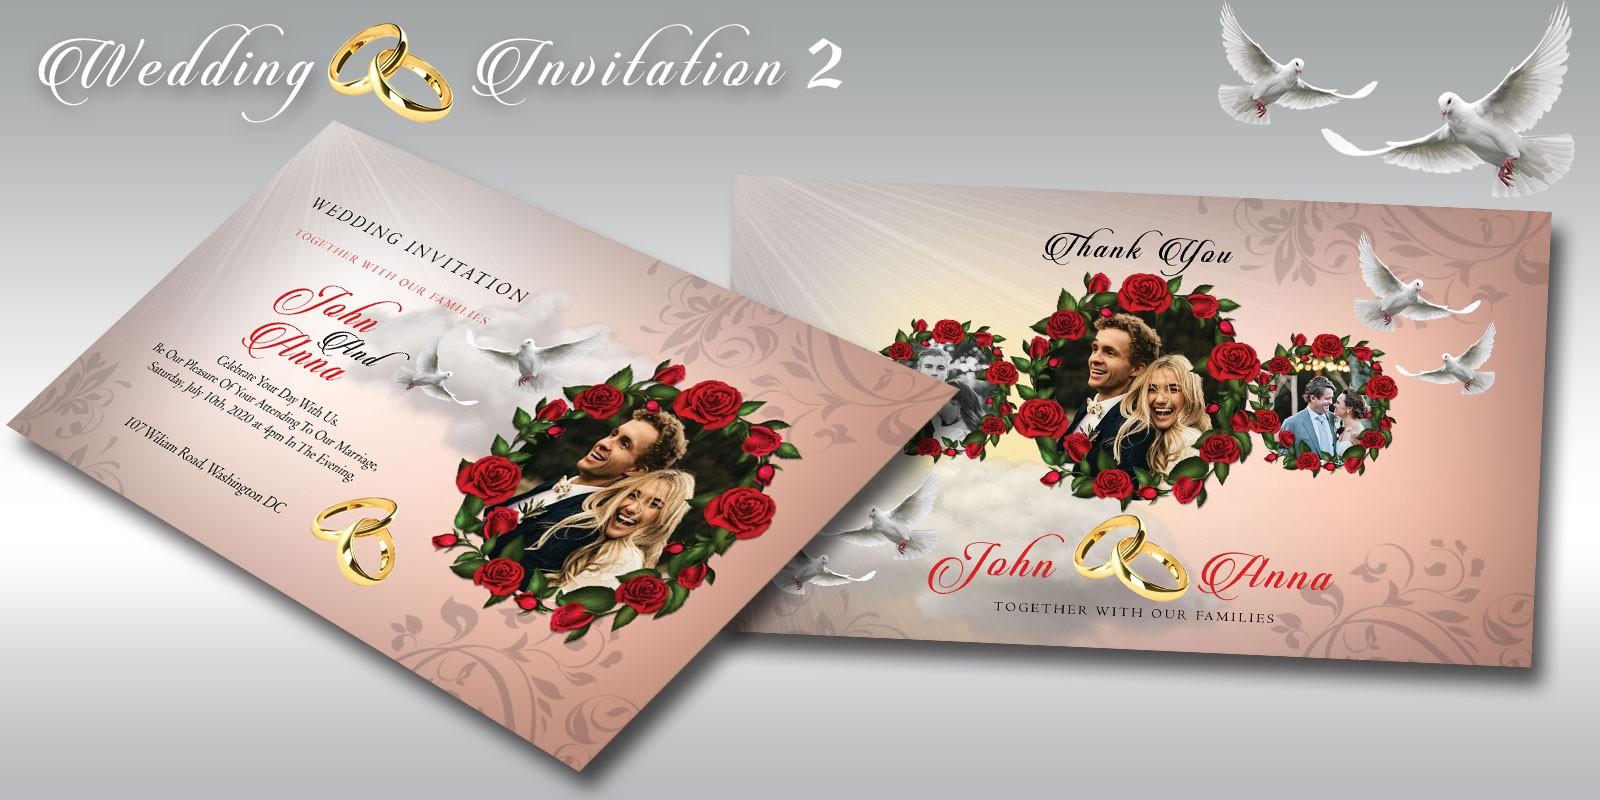 wedding invitation 2 flyer template miscellaneous print templates codester. Black Bedroom Furniture Sets. Home Design Ideas